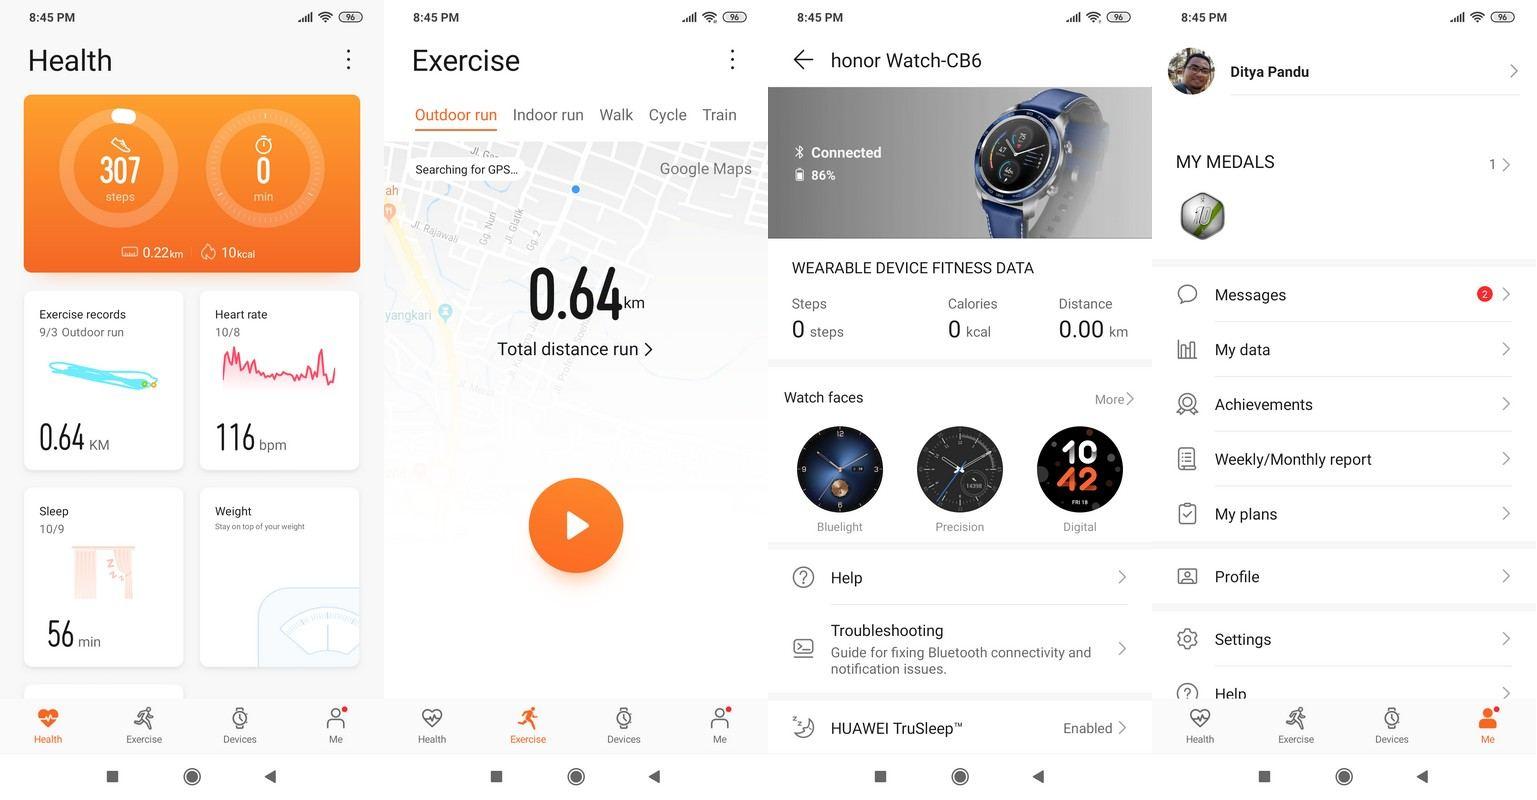 Aplikasi Huawei Health